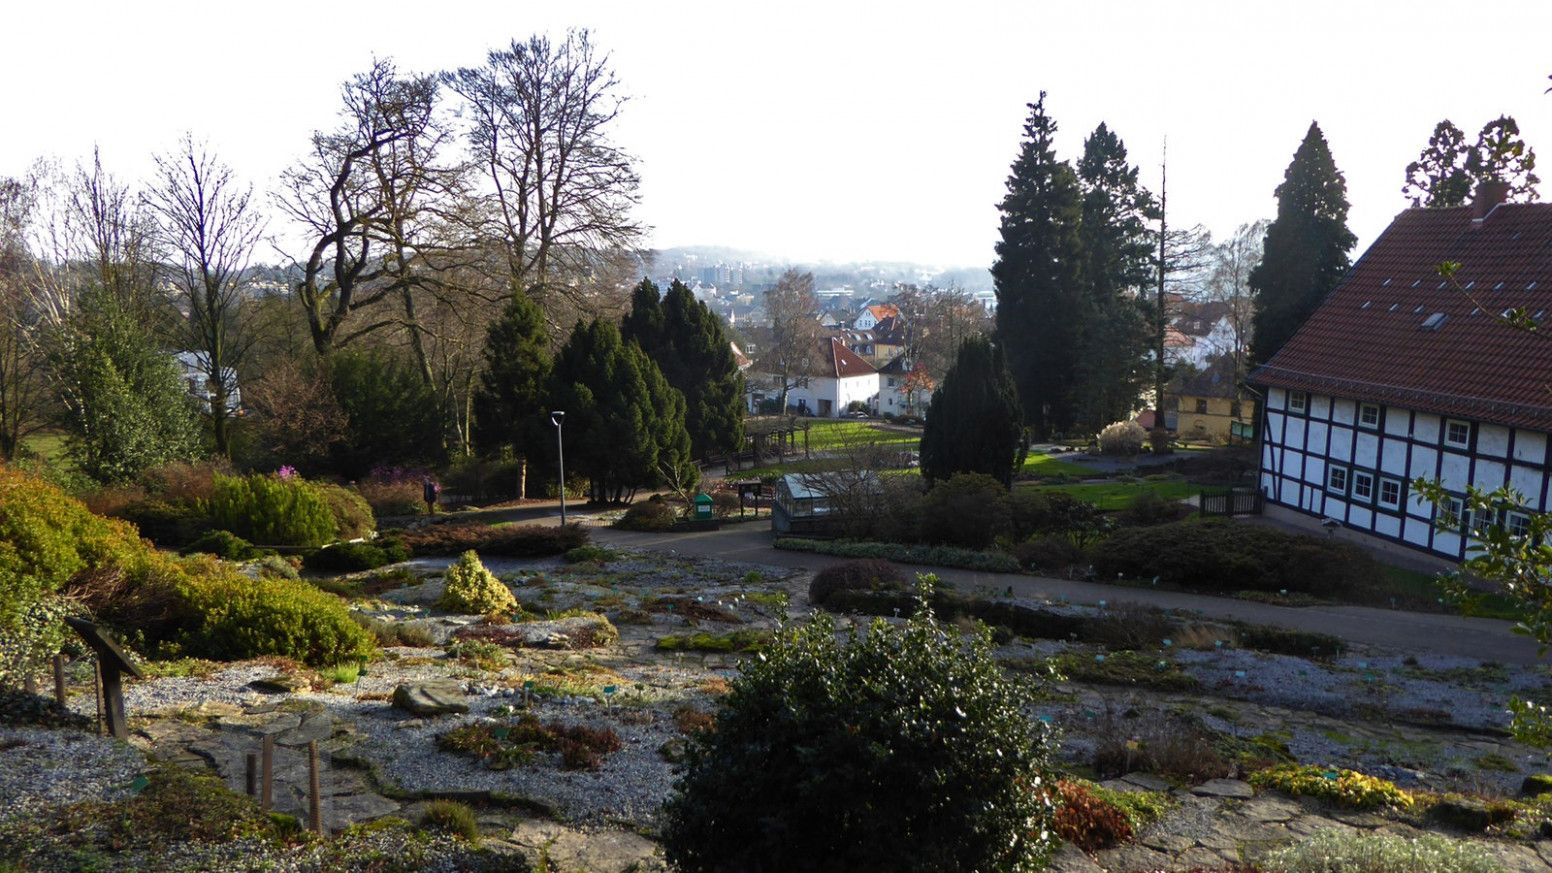 Hessens Schonste Garten Mediathek Mdr Garten Traumgarten Garten